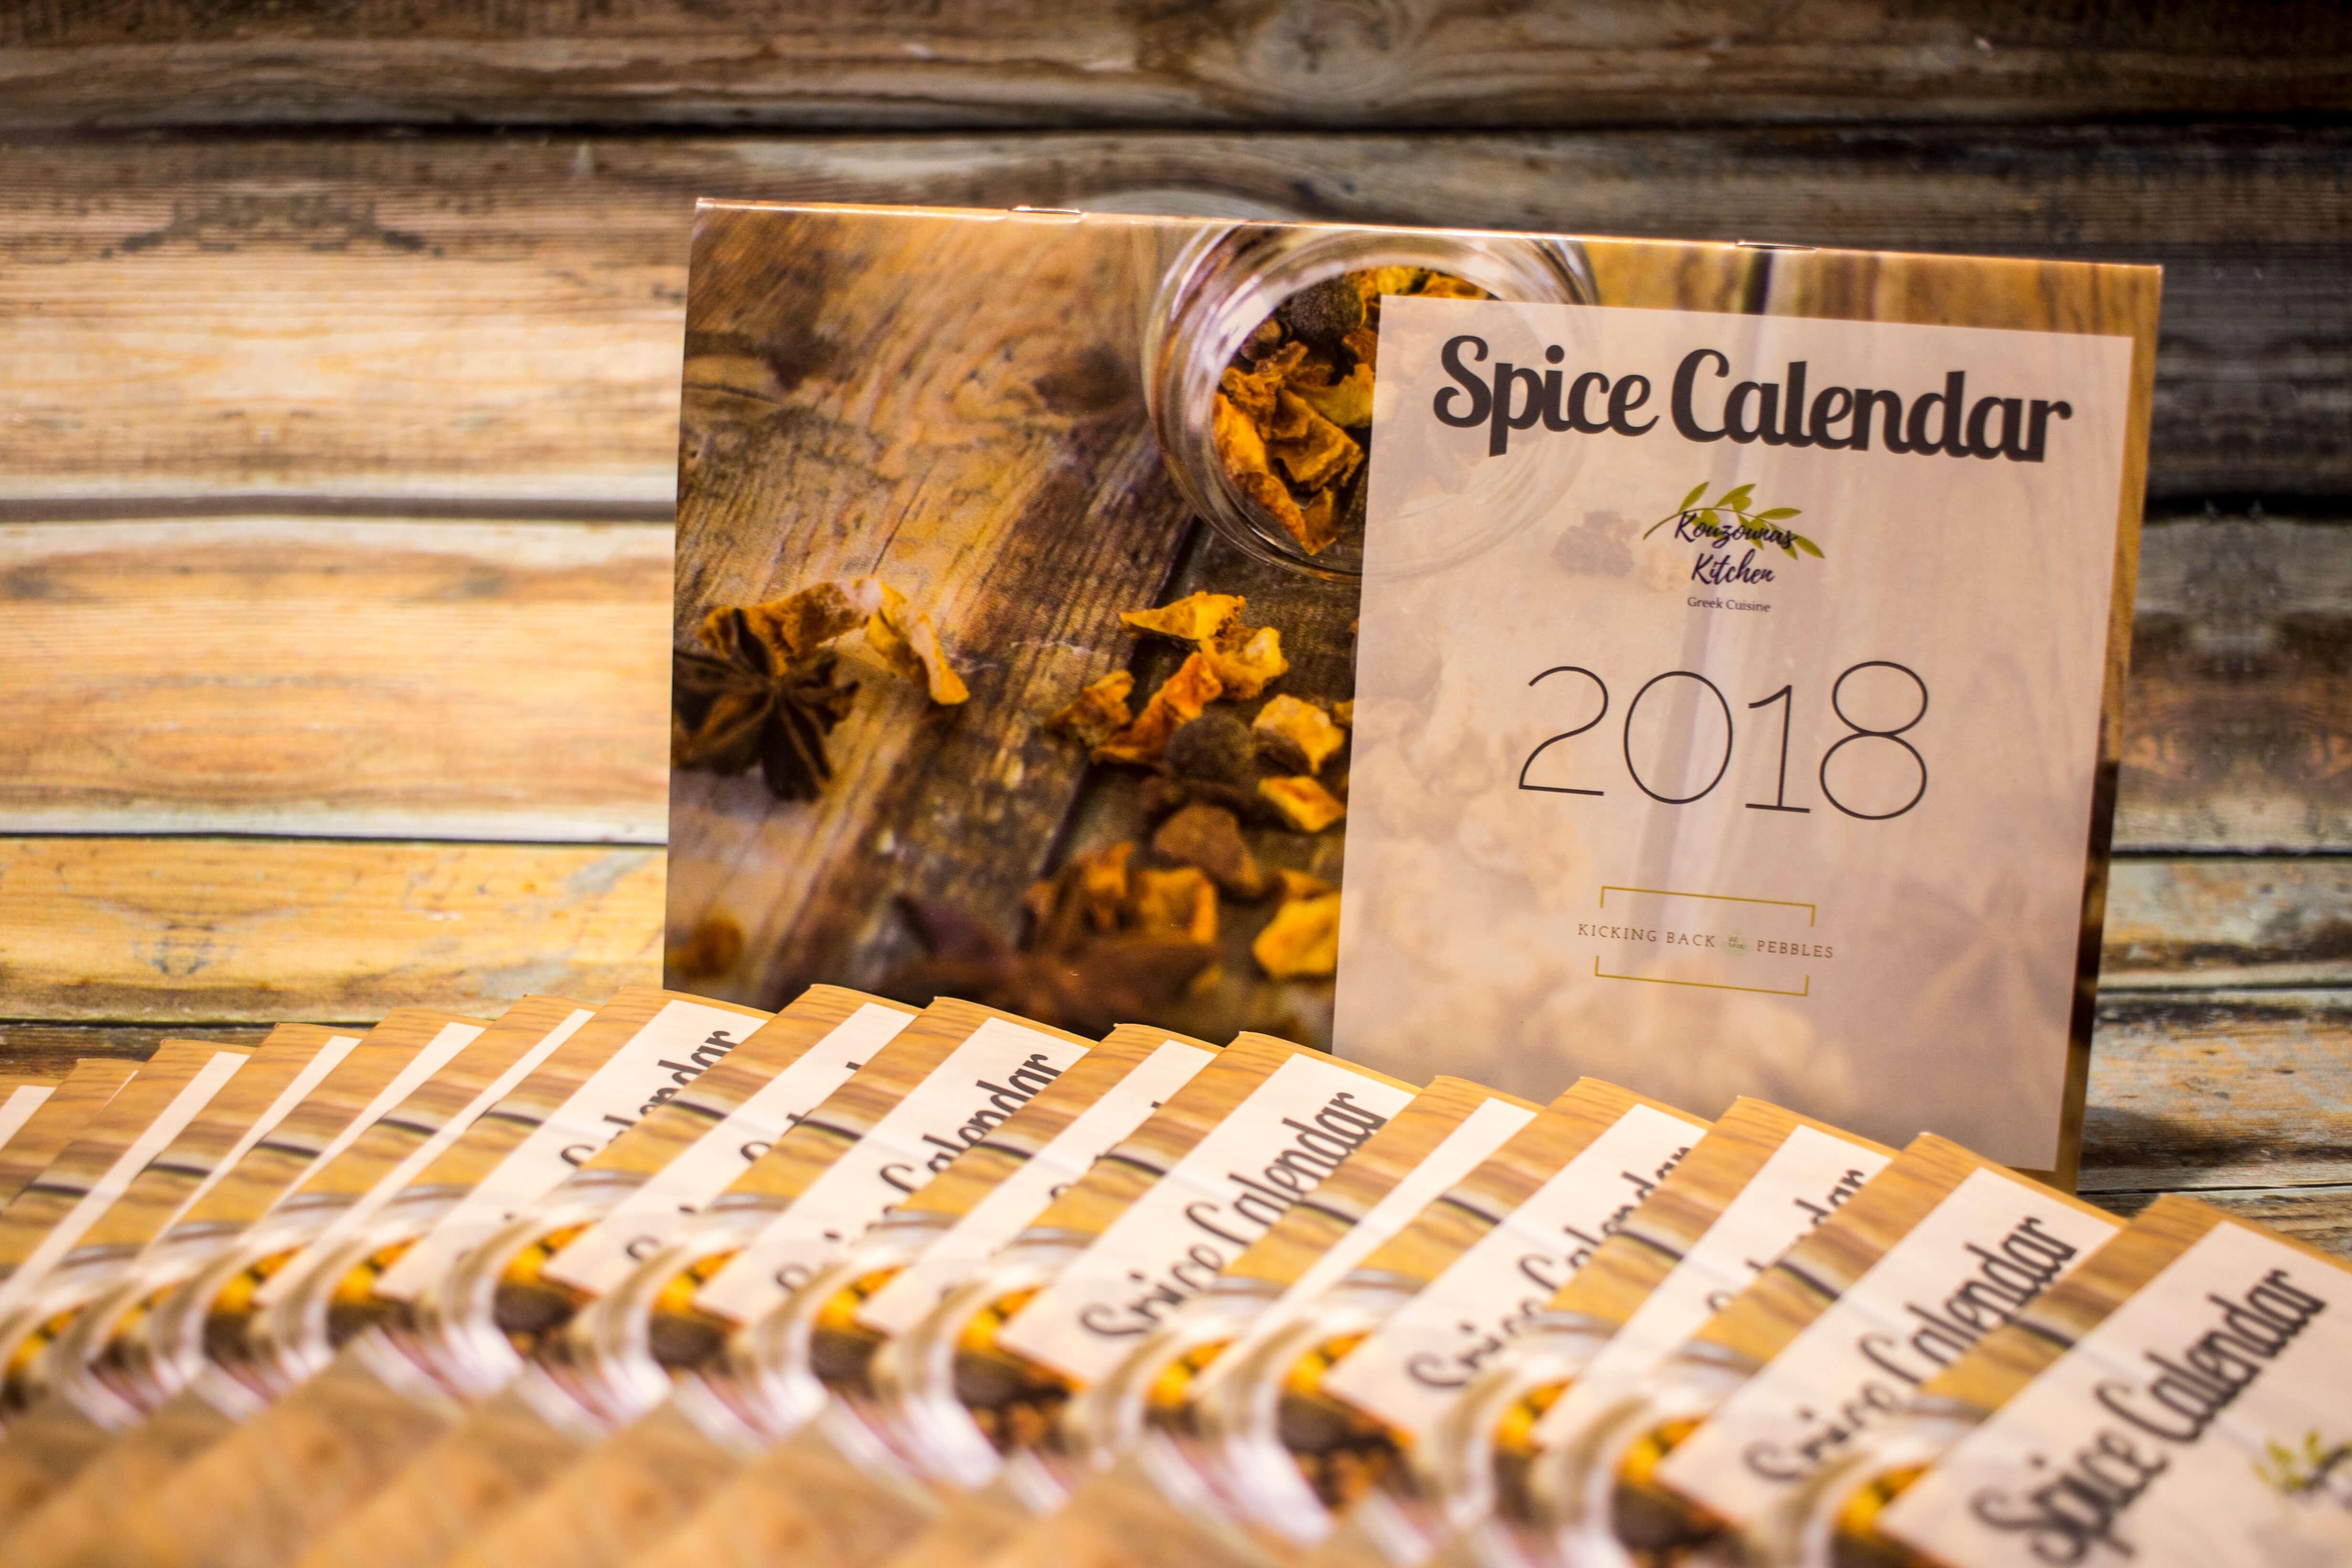 The 2018 Spice Calendar